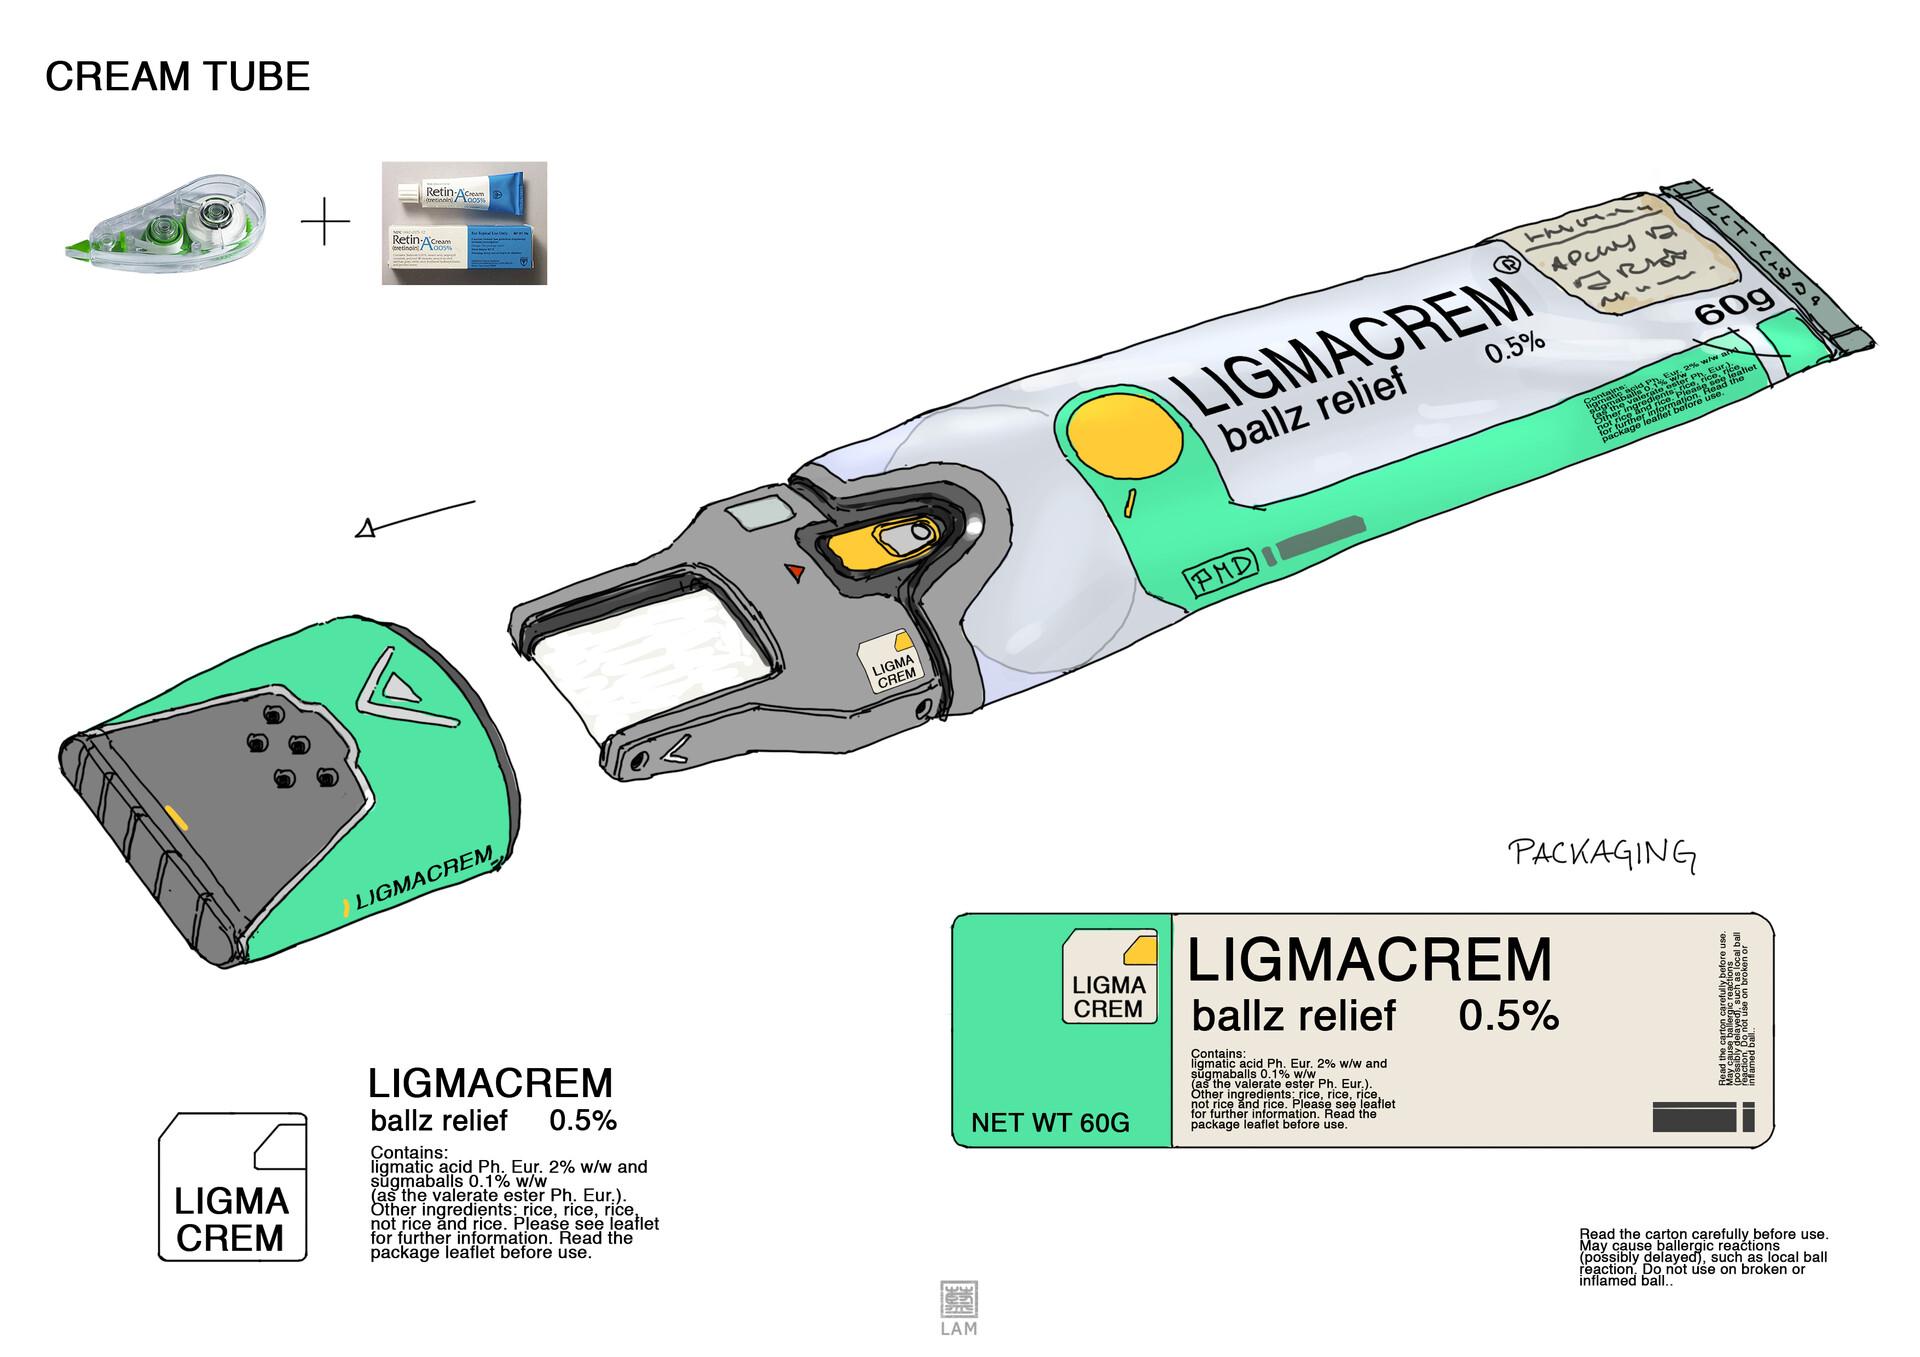 Sheng lam lube tube 17dec18